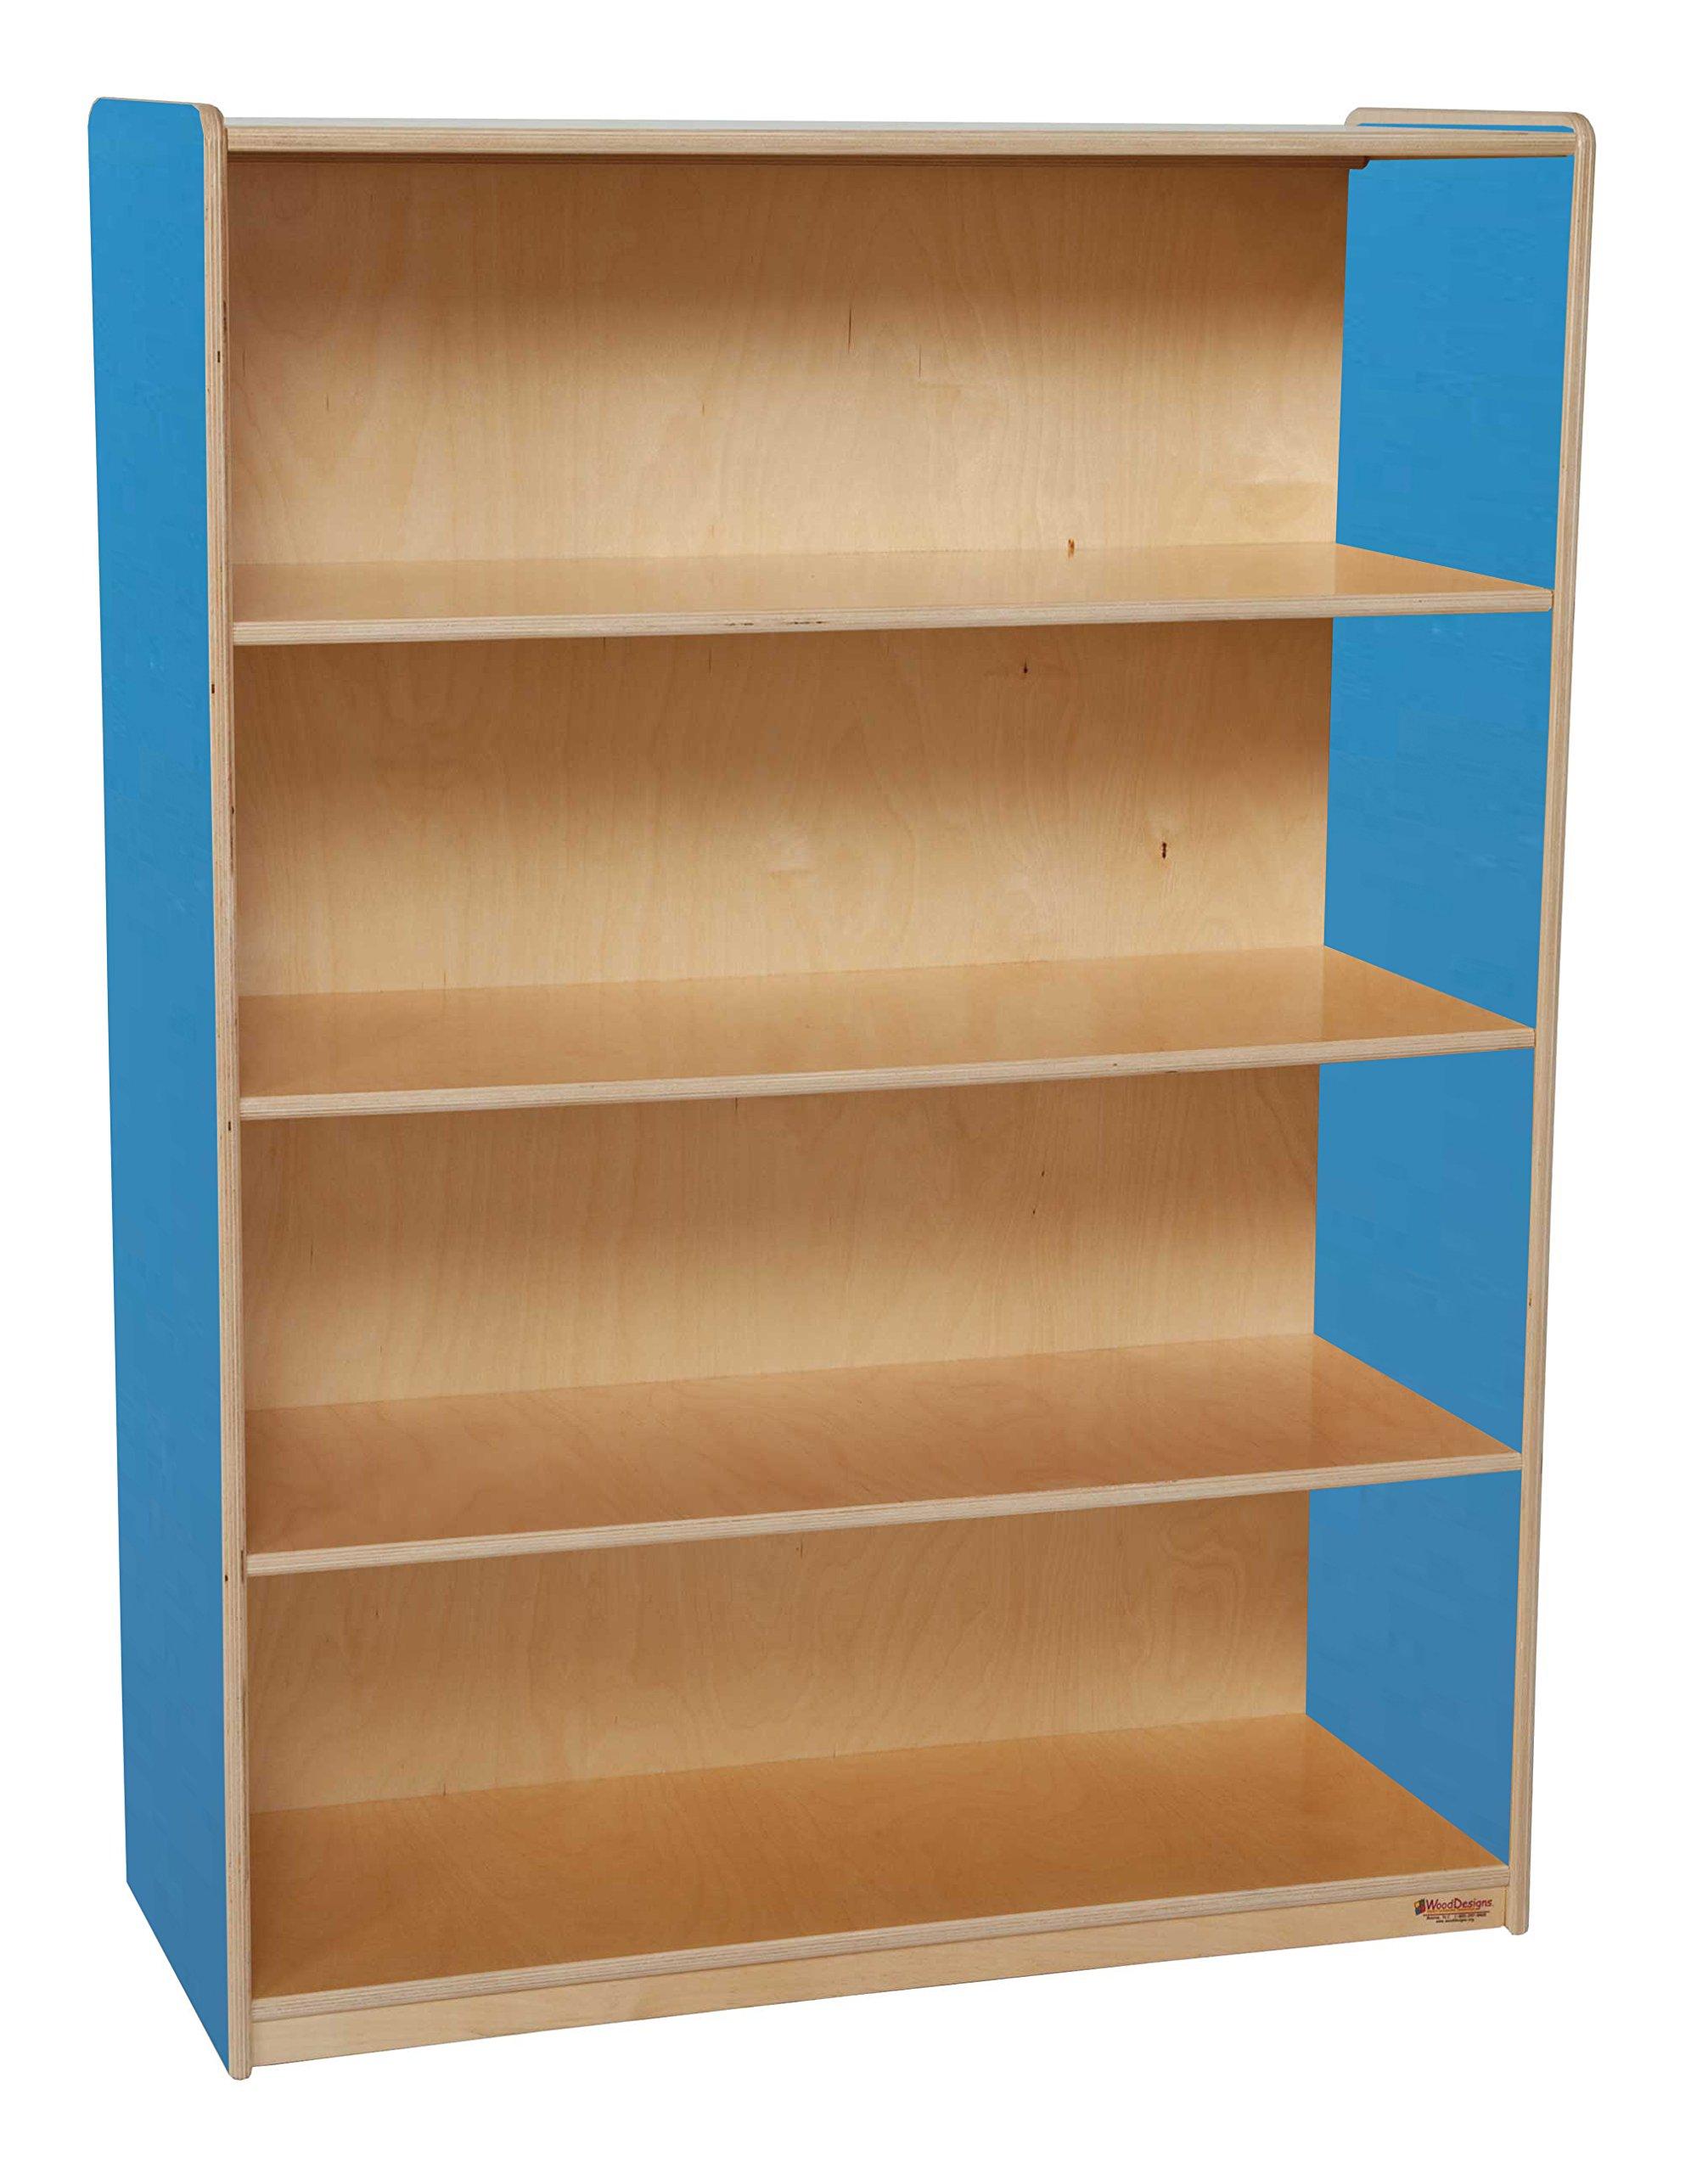 Healthy Kids Colors WD12900B Blueberry Bookshelf, 48''H